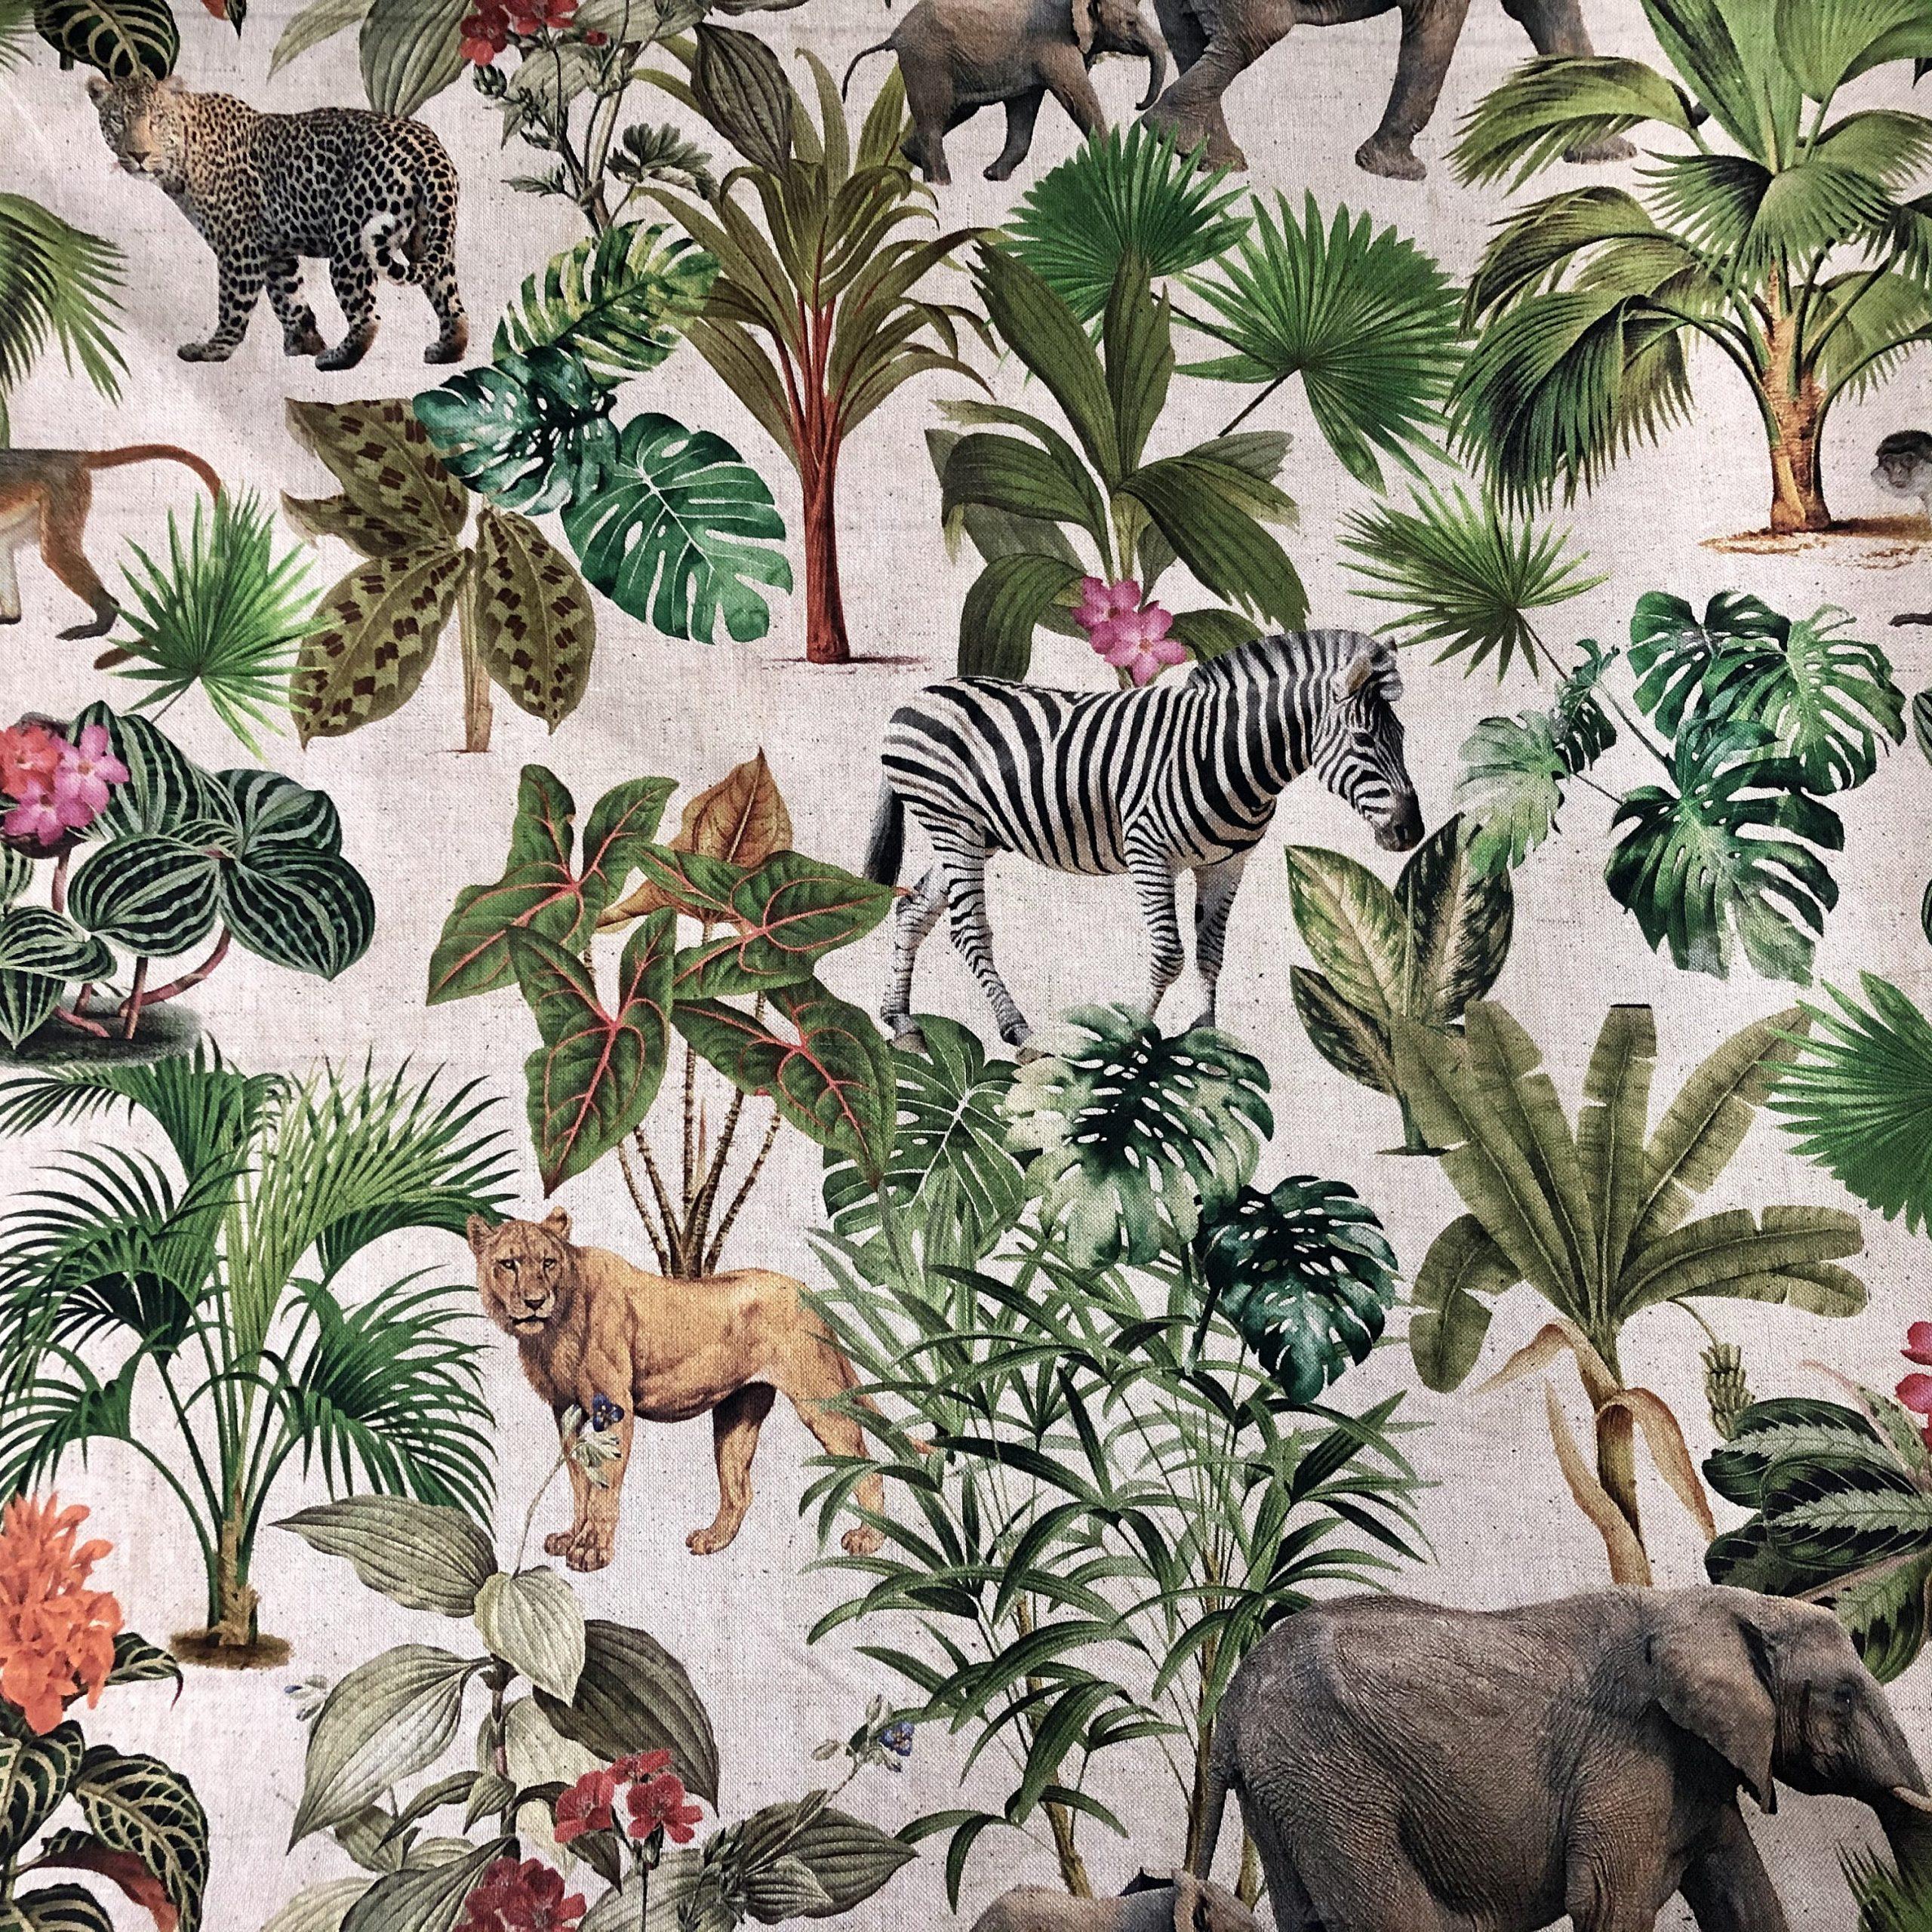 "Safari Zoo African Animal Digital Print Fabric Tropical Jungle Palm Flower Leaf Material Linen Look  – 54""/138cm wide Canvas"